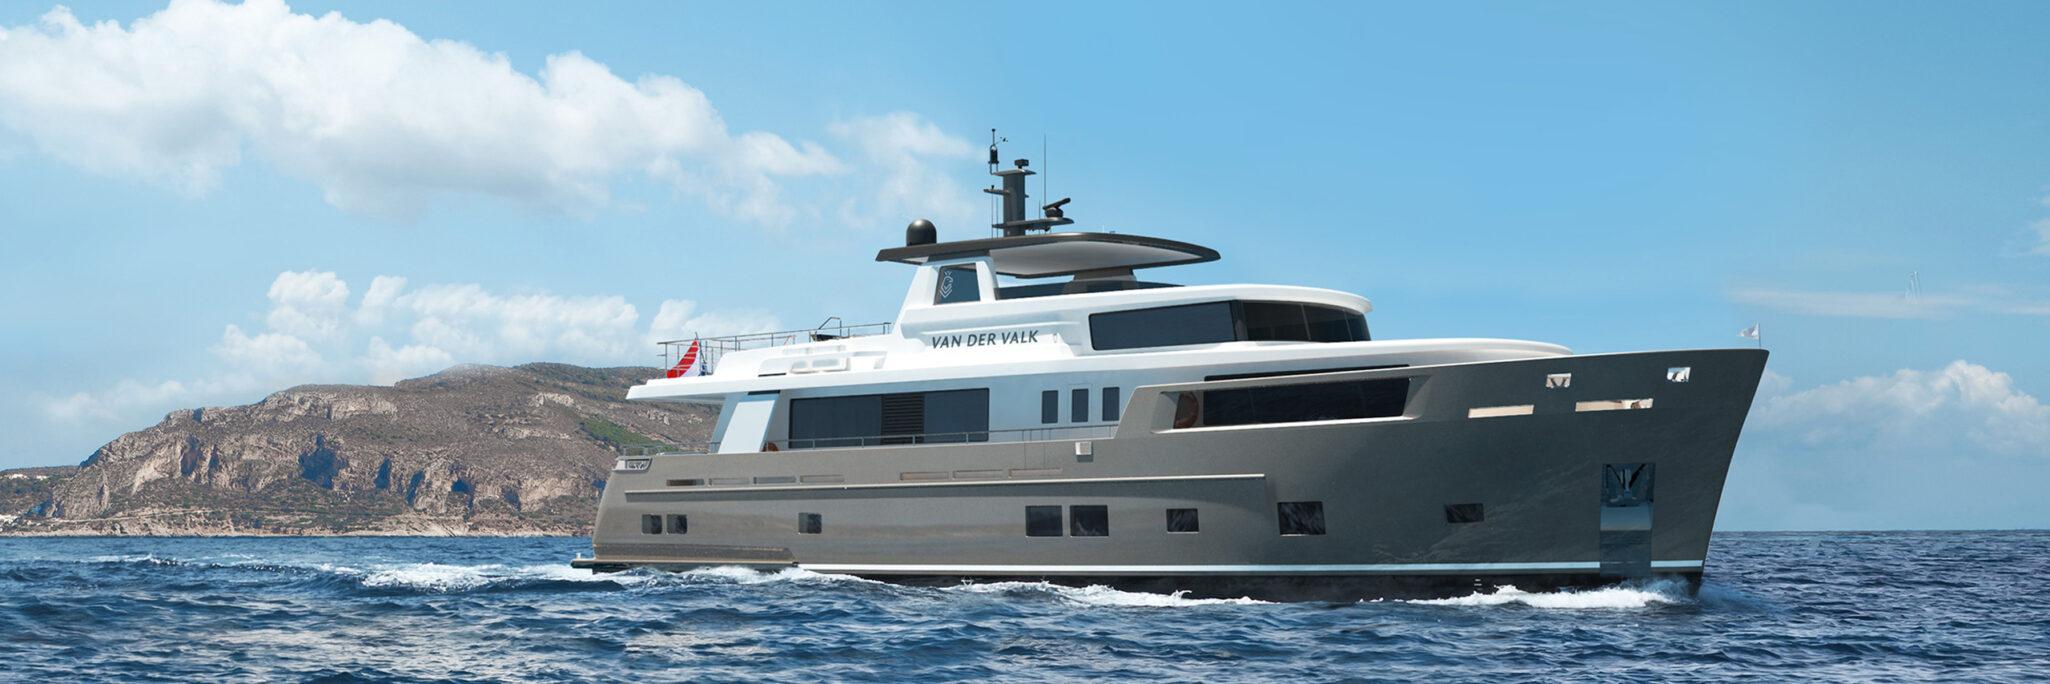 Van der Valk yachts for sale